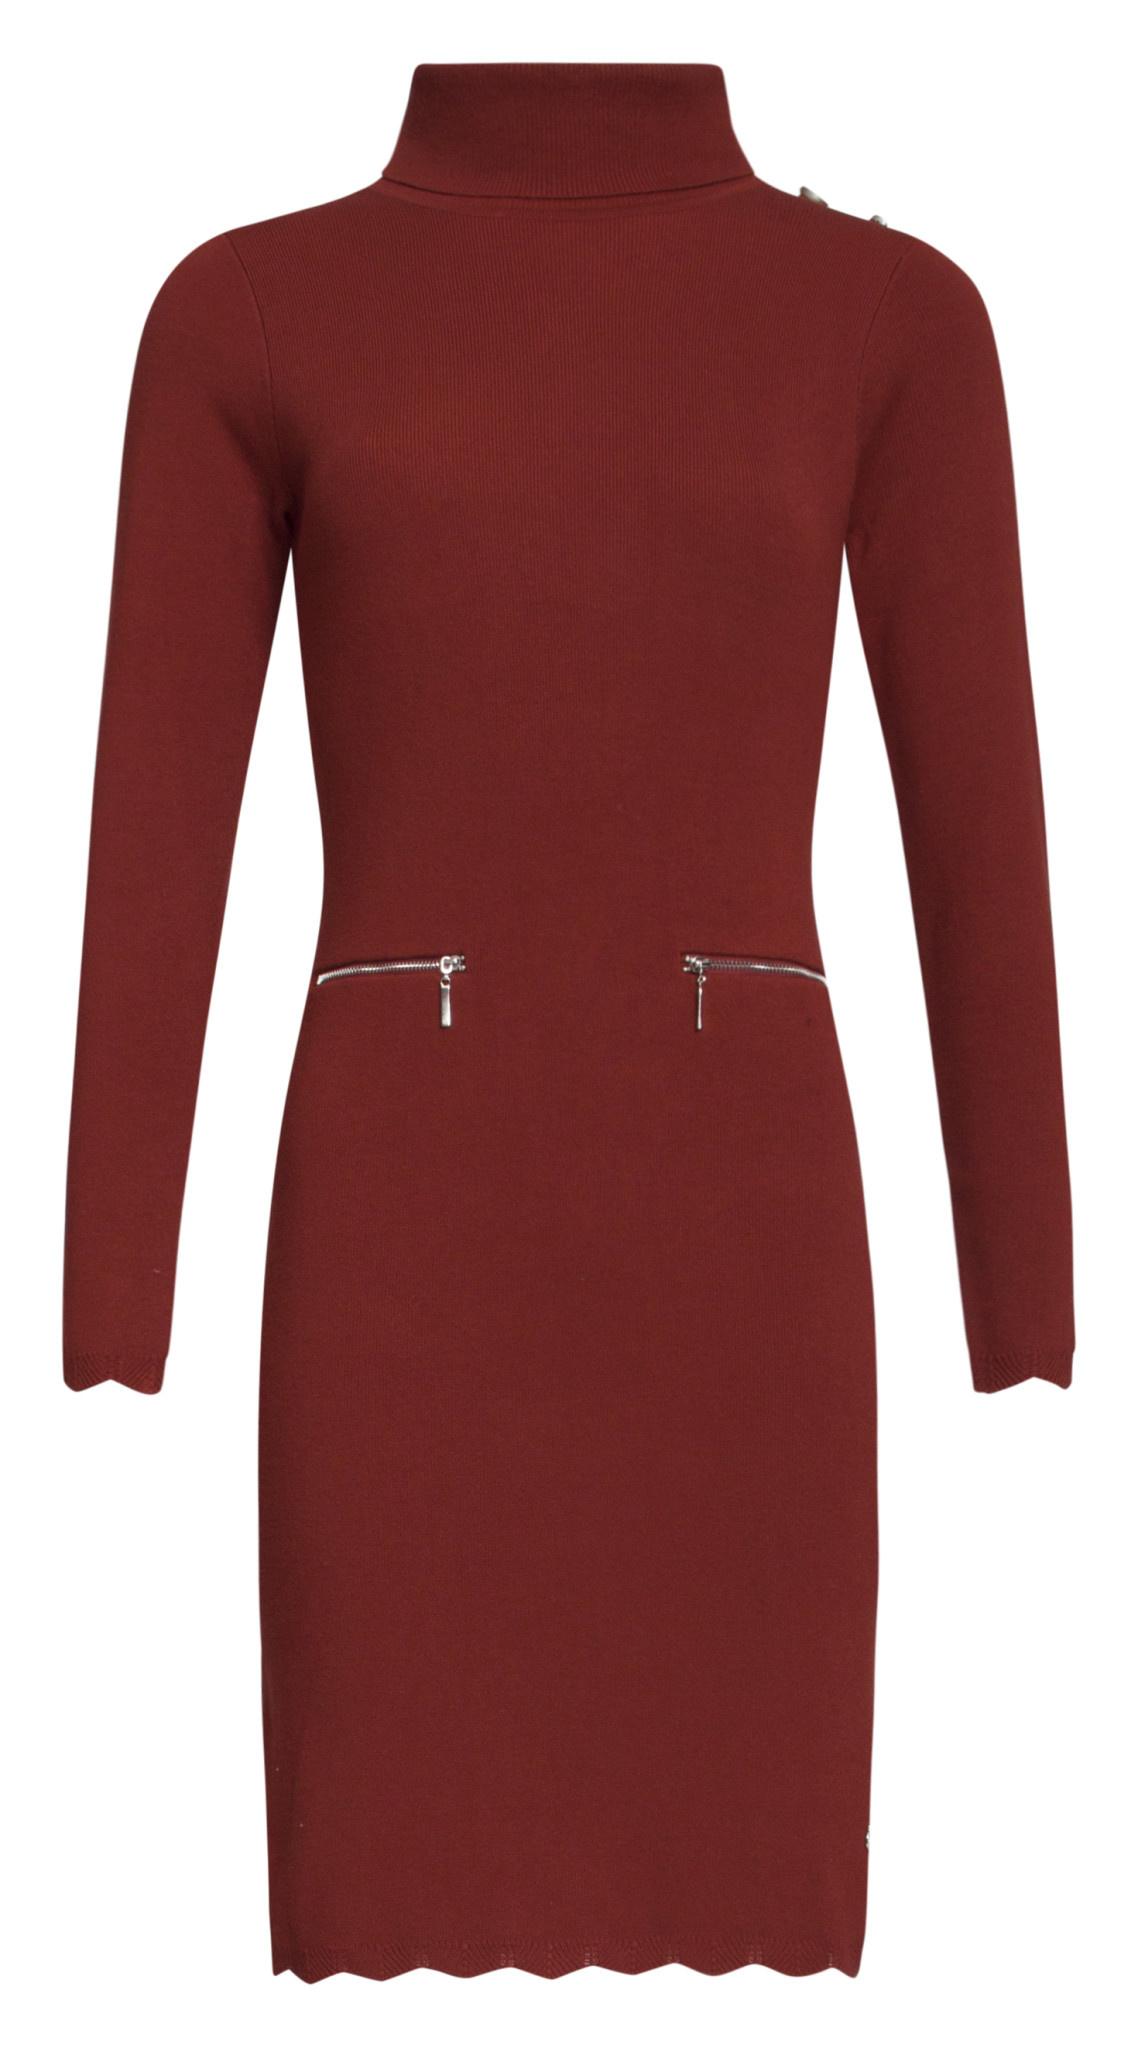 Knit Dress - Cognac